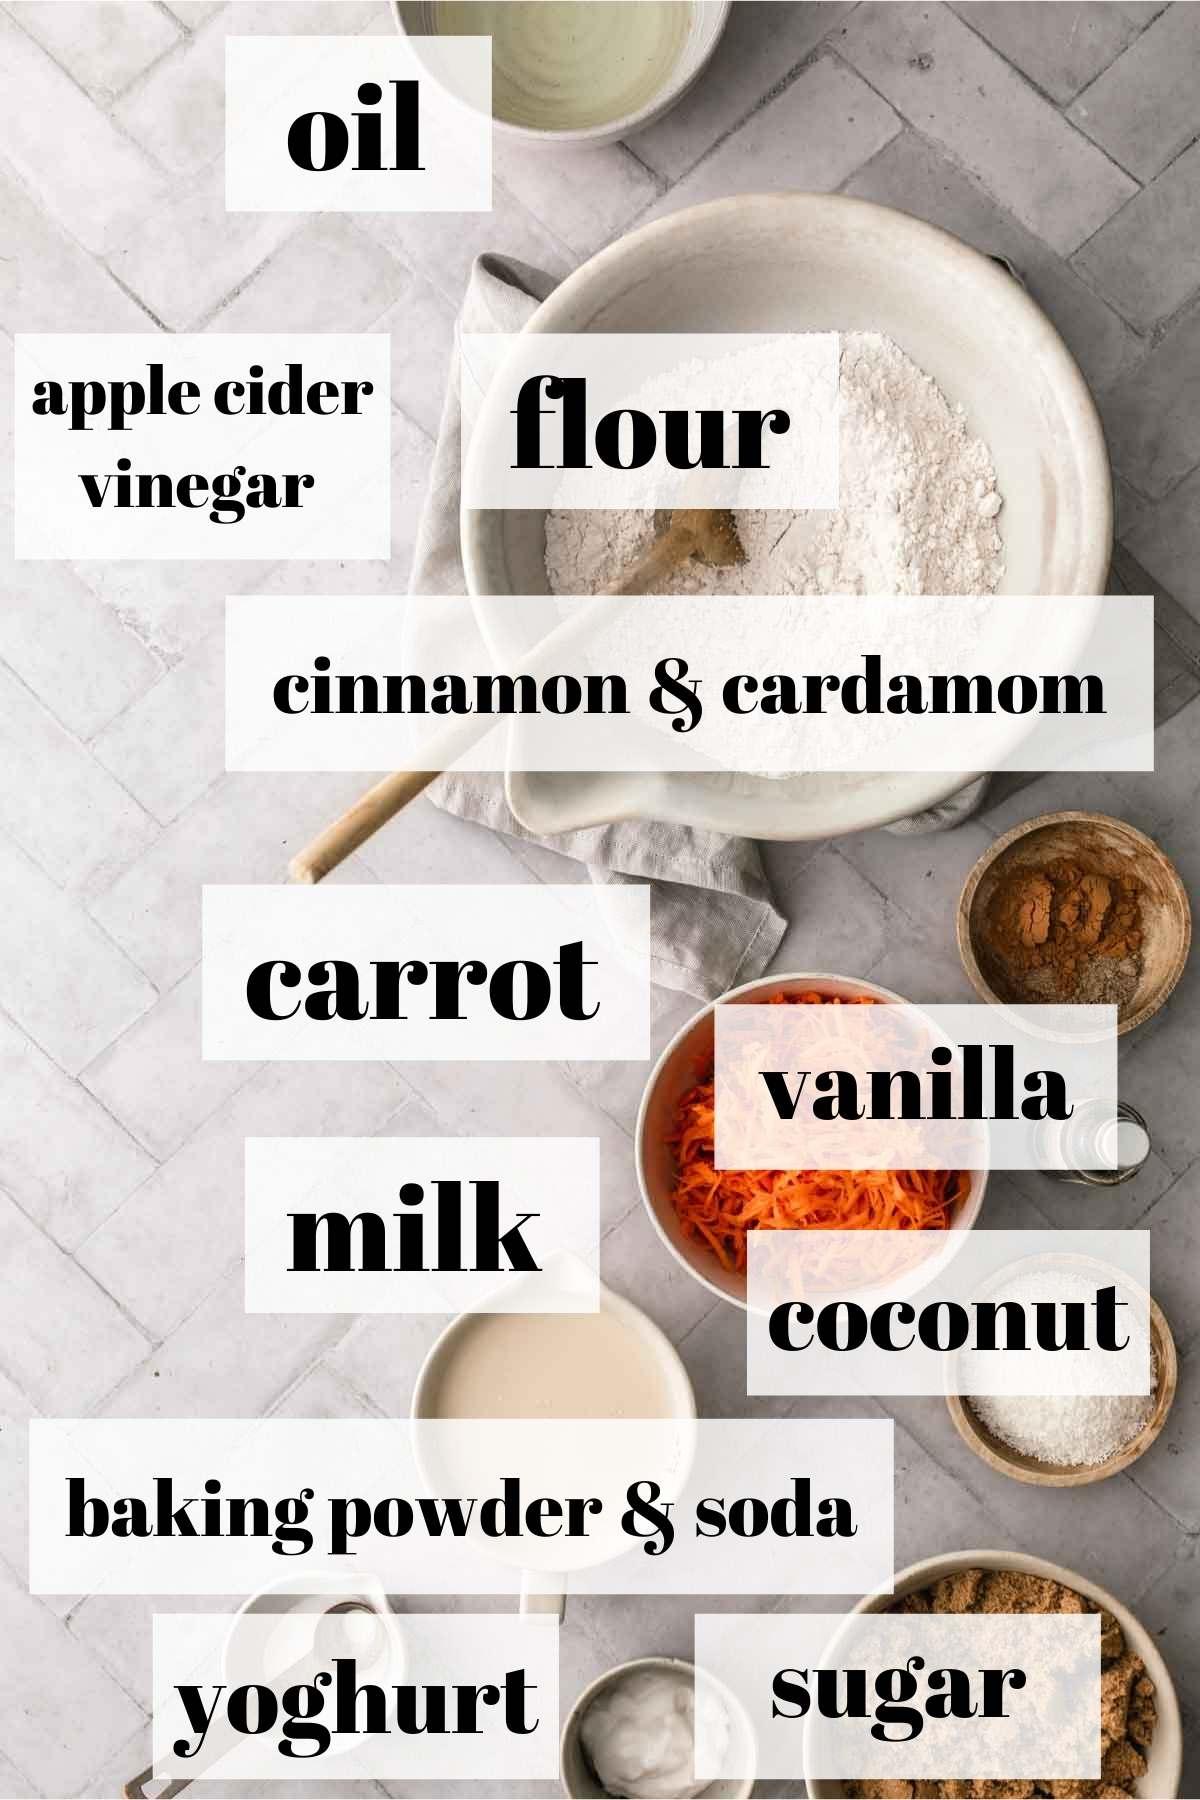 Carrot cake ingredients in bowls.